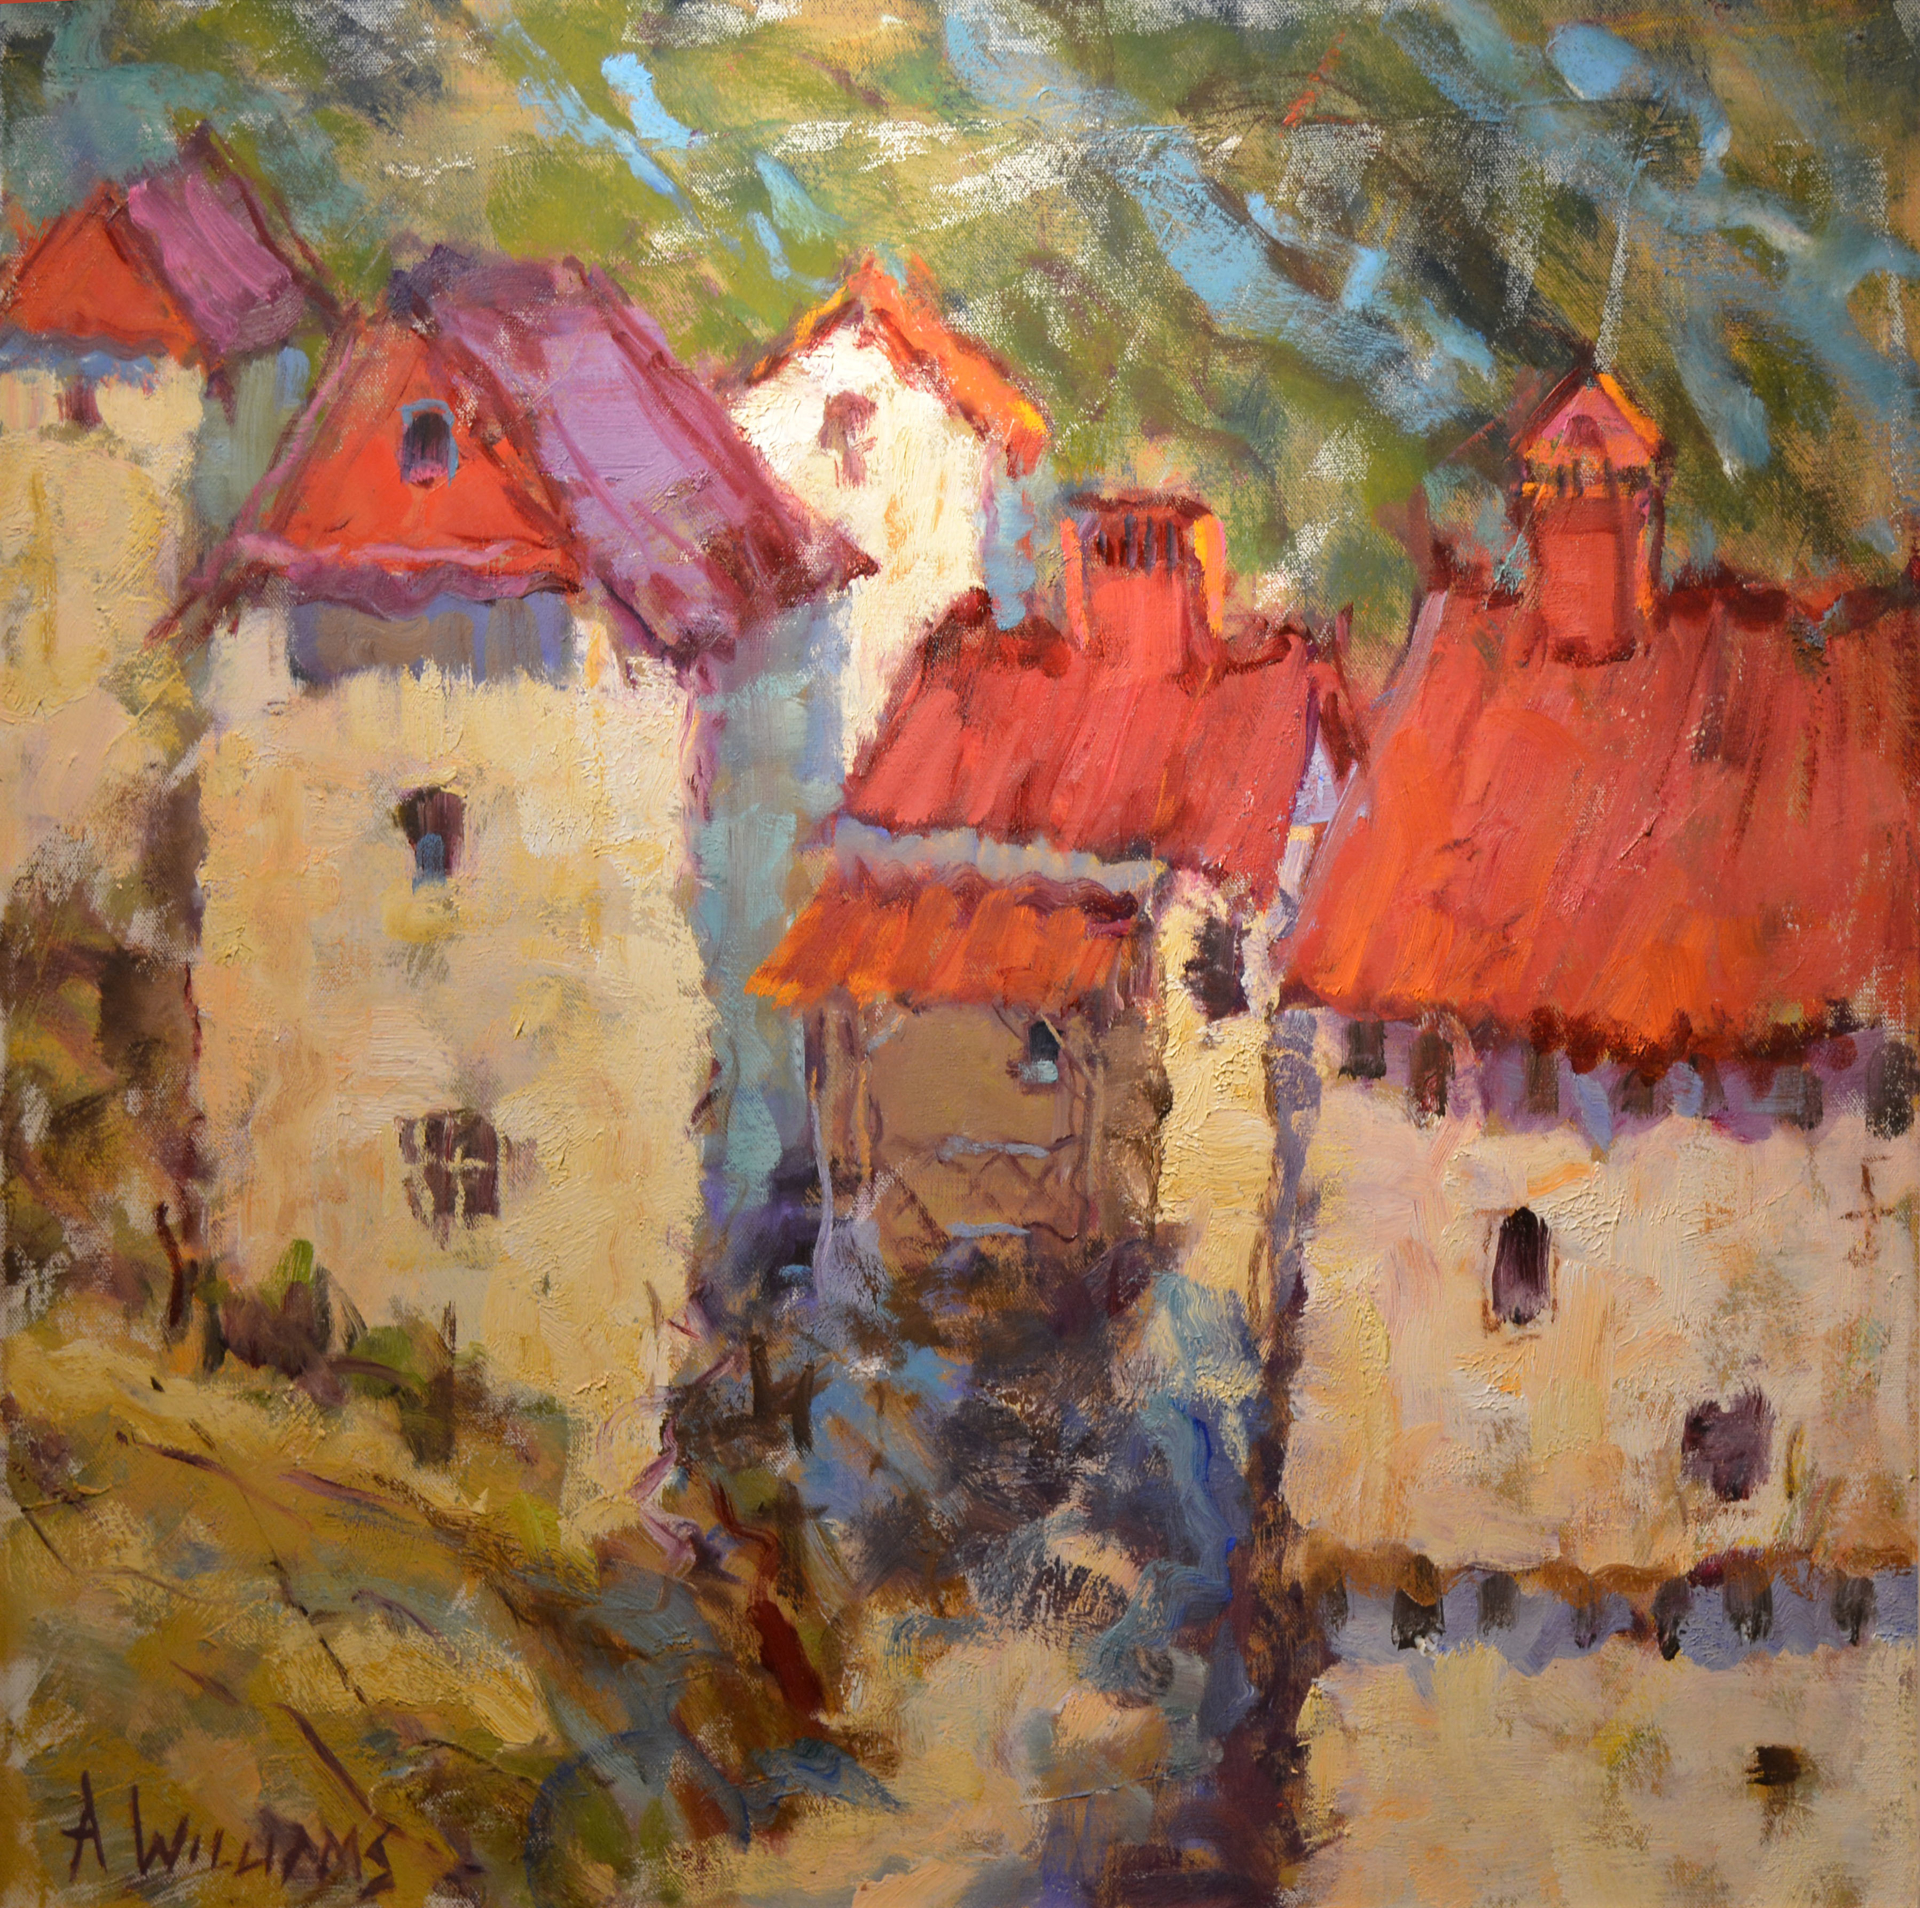 La Ville de St Cirq La Popie by Alice Williams